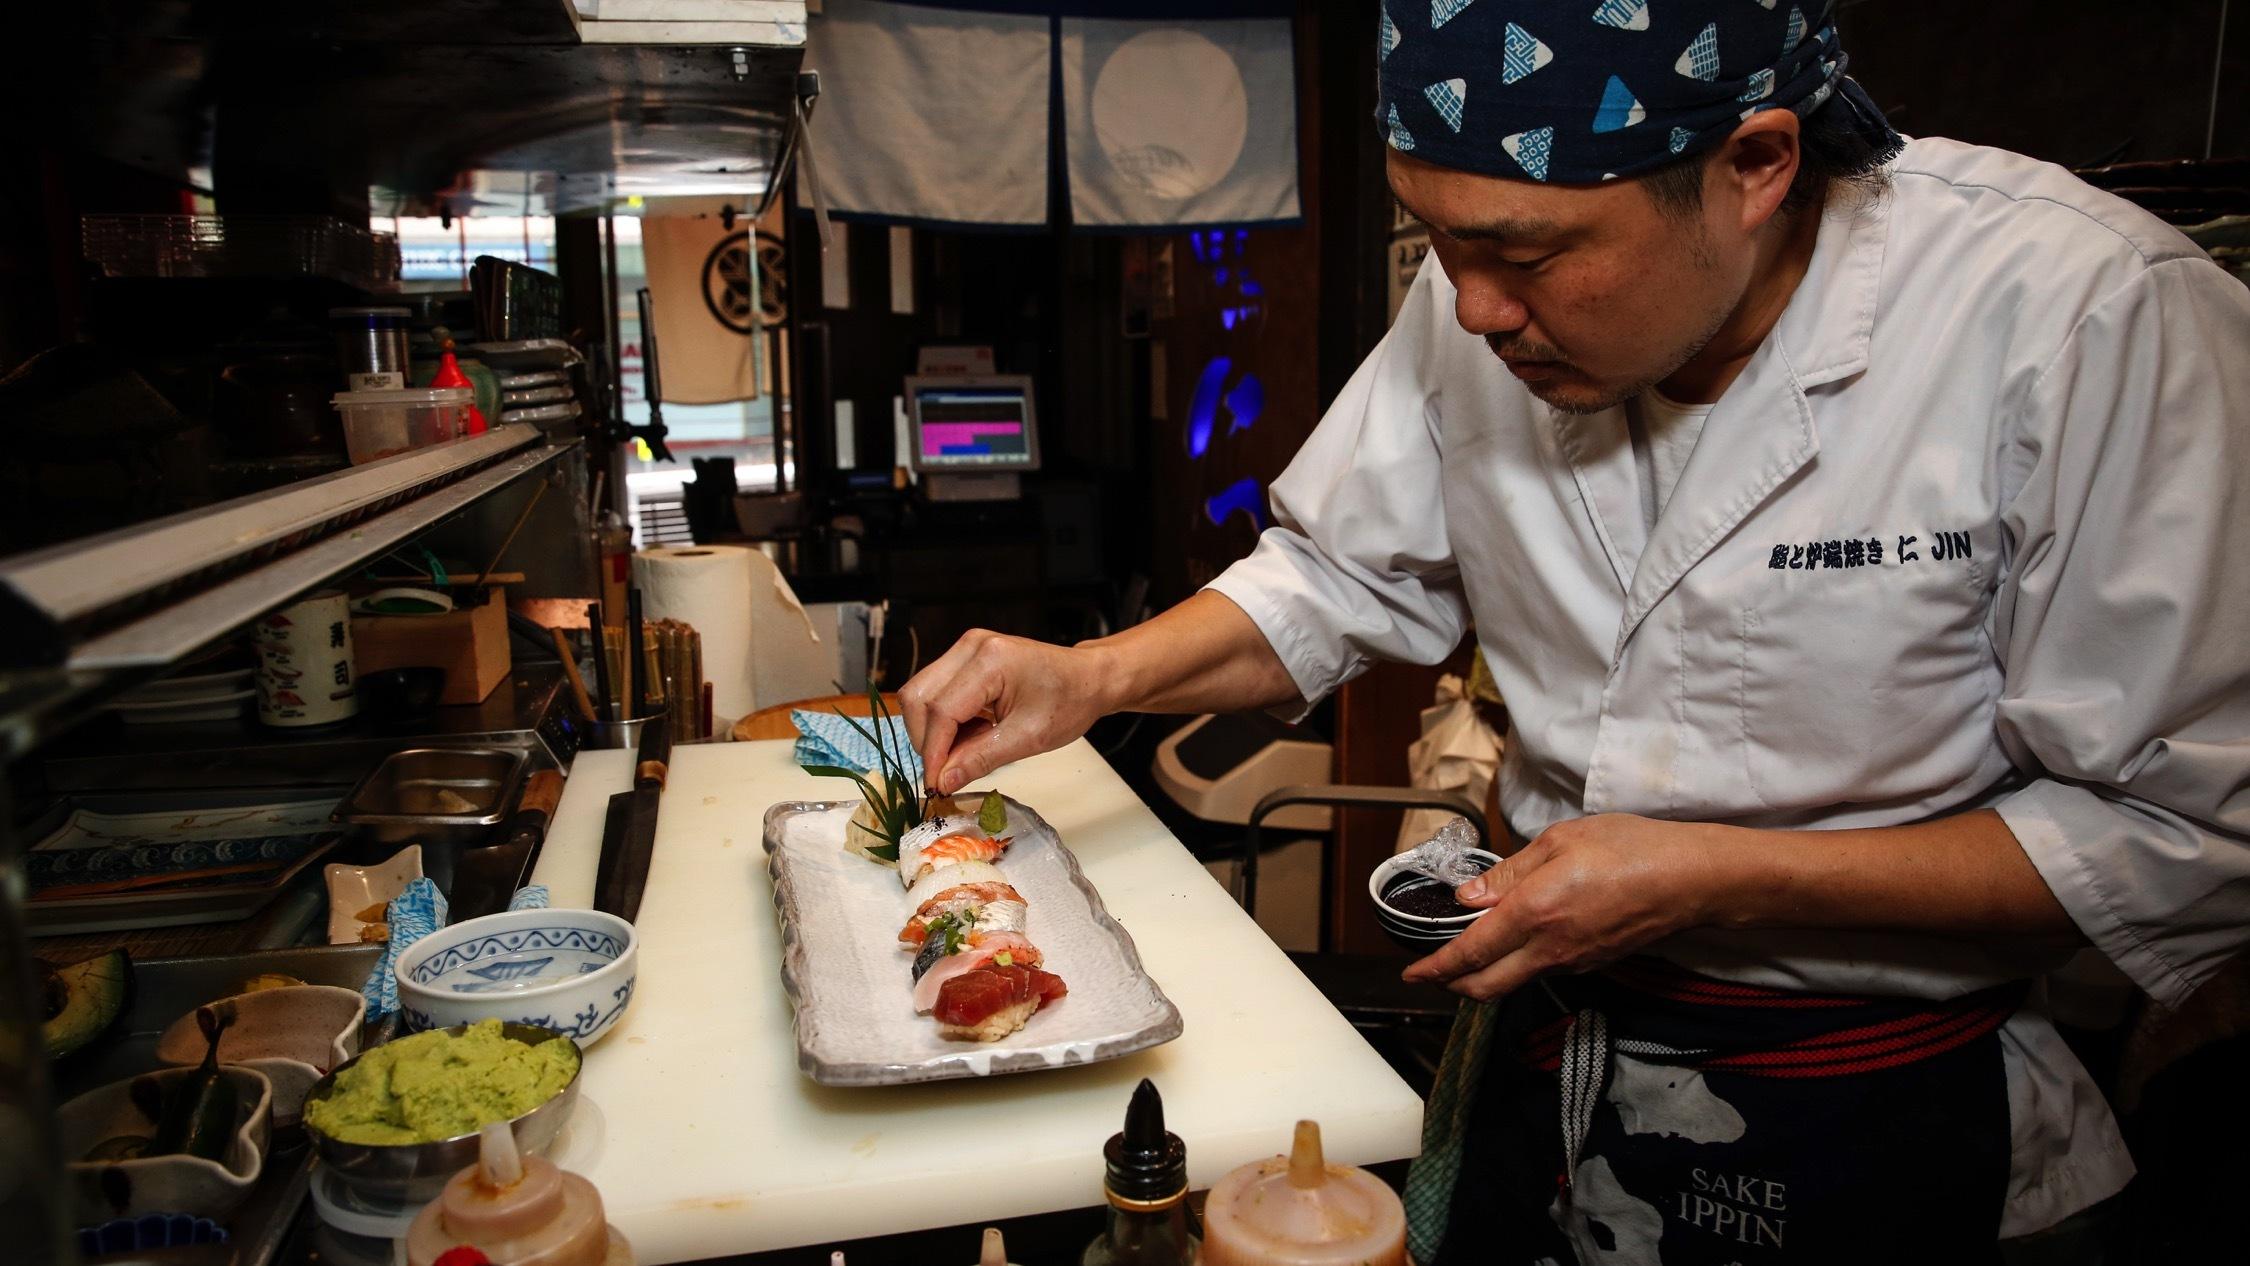 Making sushi at Yakitori Jin